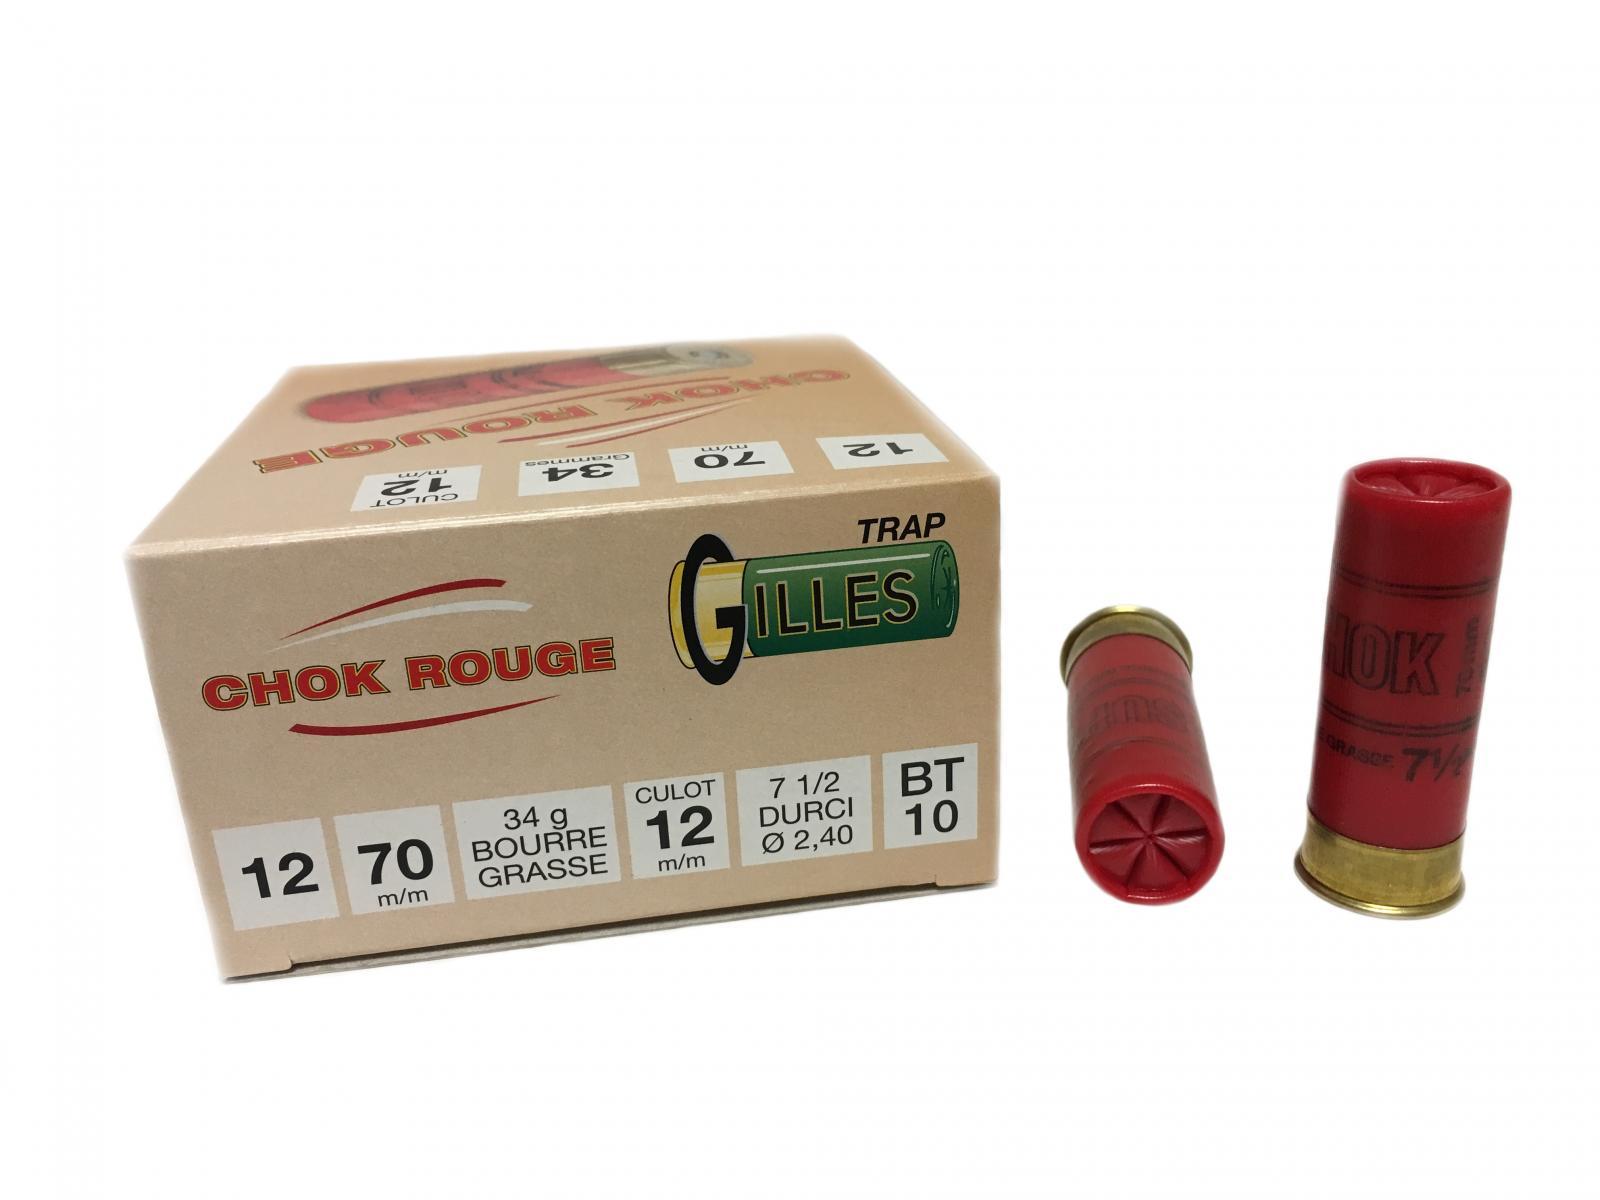 Boite de 25 cartouches CHOK ROUGE cal 12 BT10